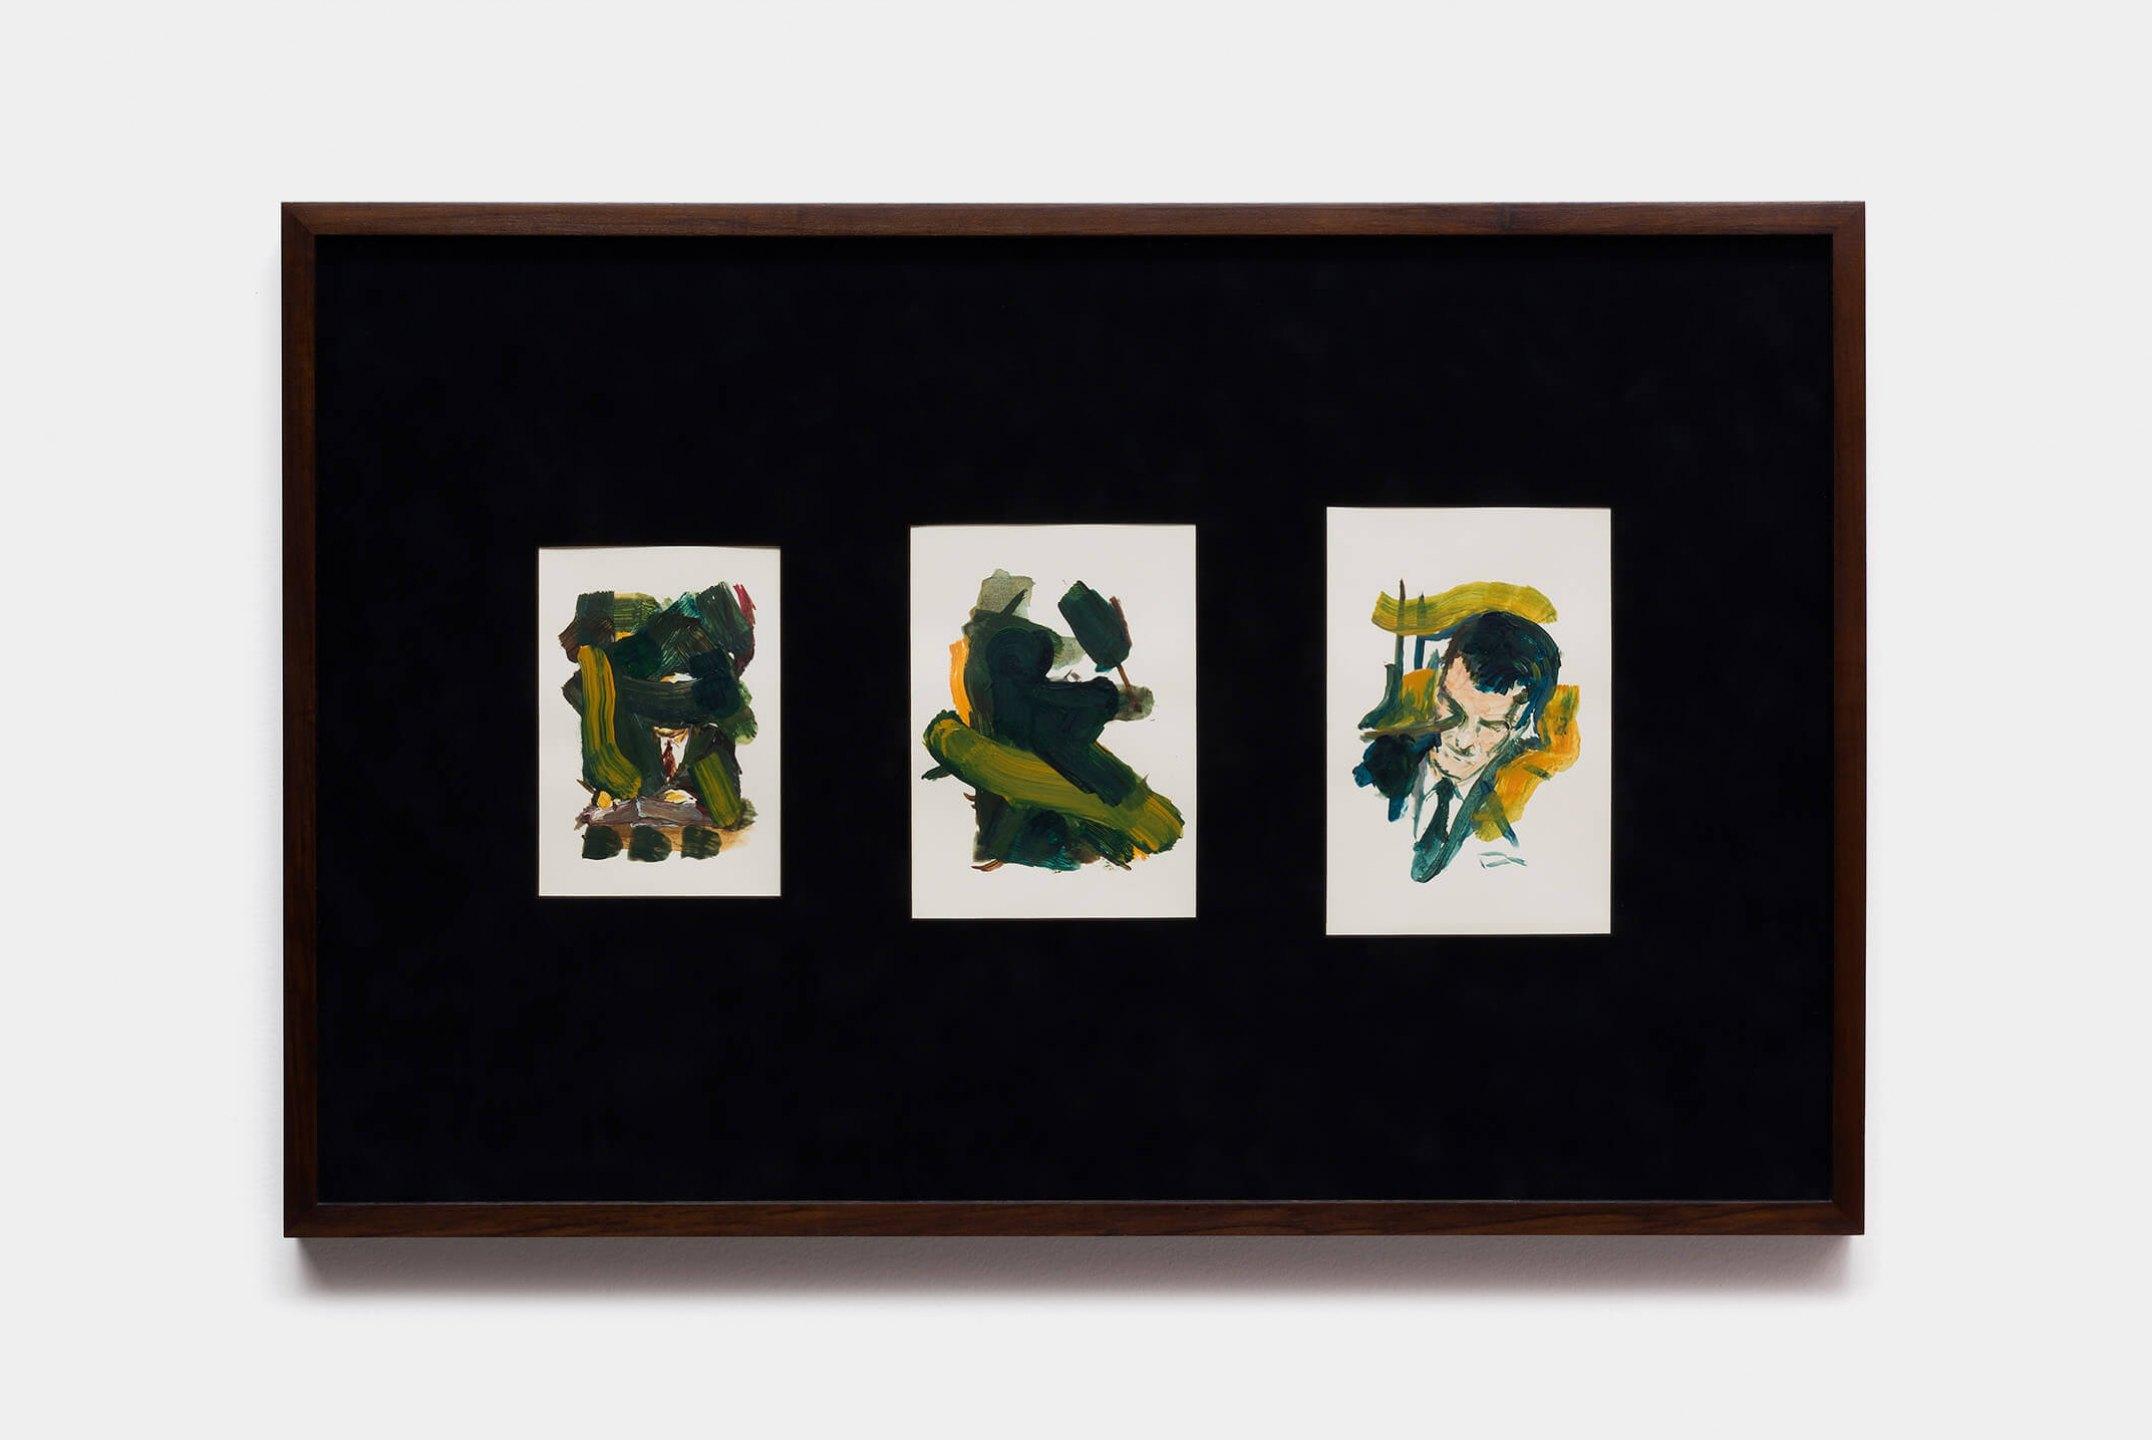 Deyson Gilbert, <em>untitled (from Questão de Ordem ou Estudos Sobre a Síndrome de Gerstmann series)</em>, 2015, oil on paper, 45 ×70 cm - Mendes Wood DM